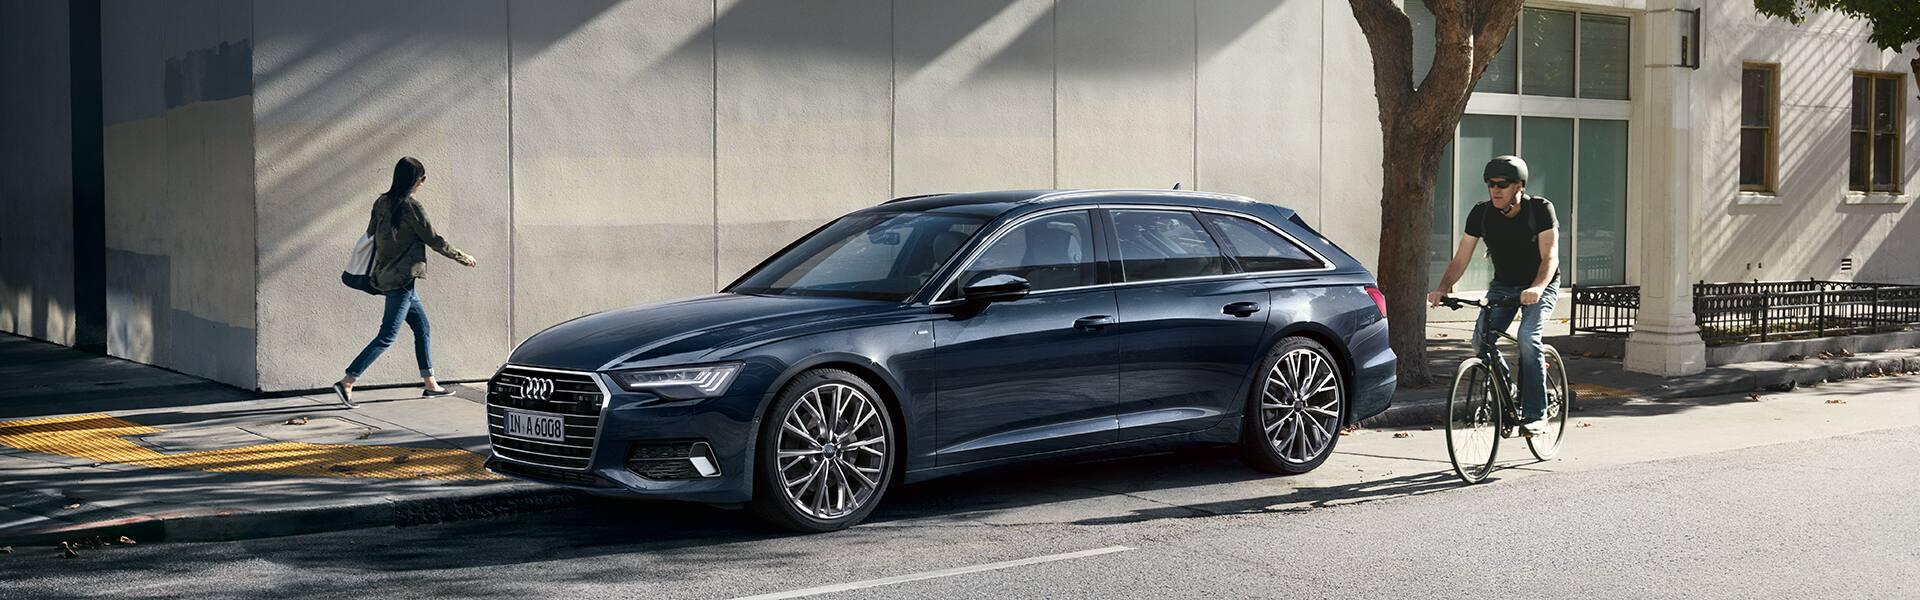 Nowe Audi A6 Avant